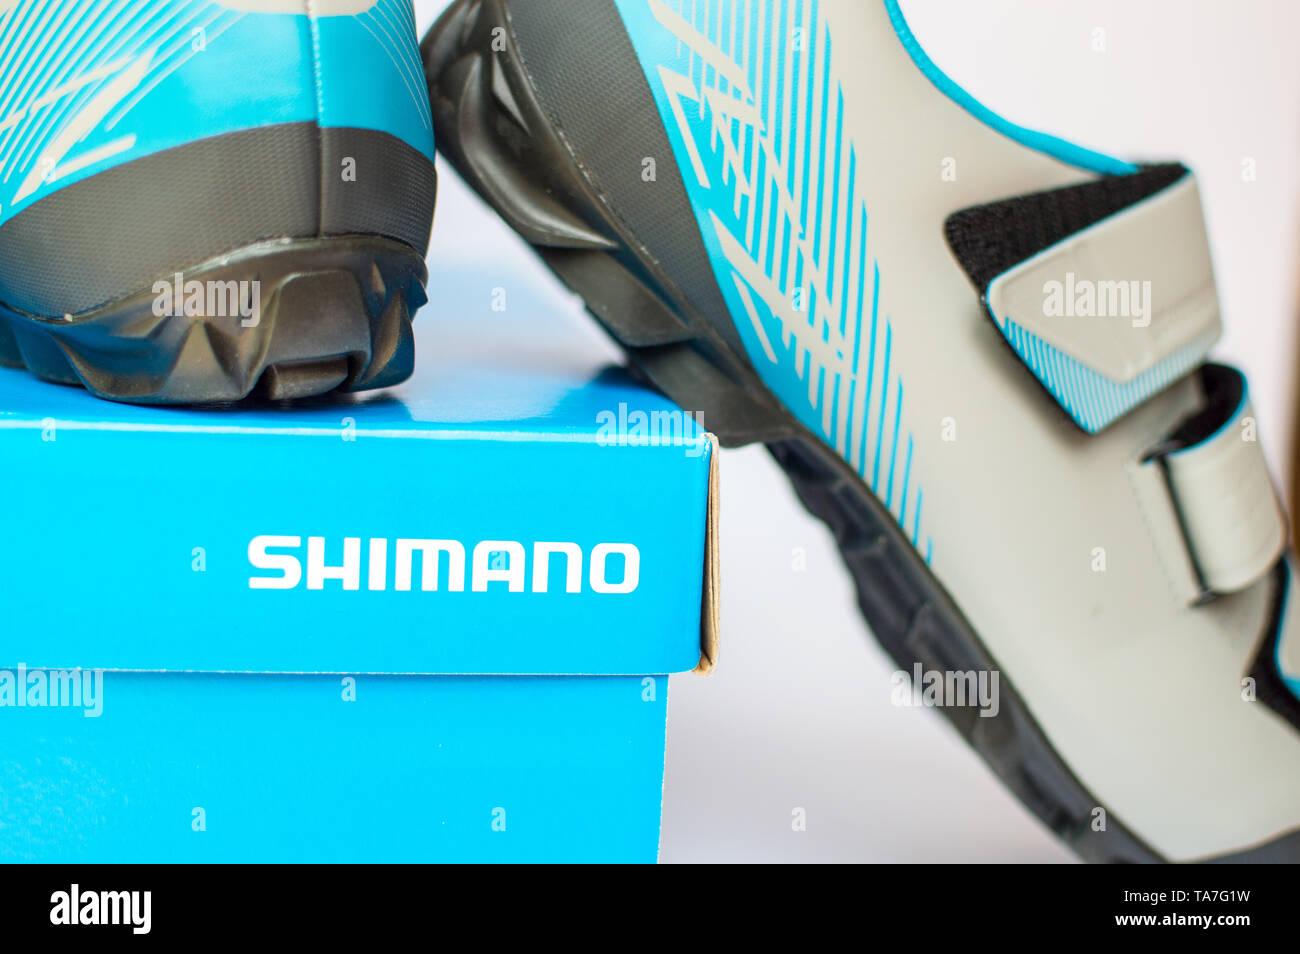 Shimano Stock Photos & Shimano Stock Images - Alamy